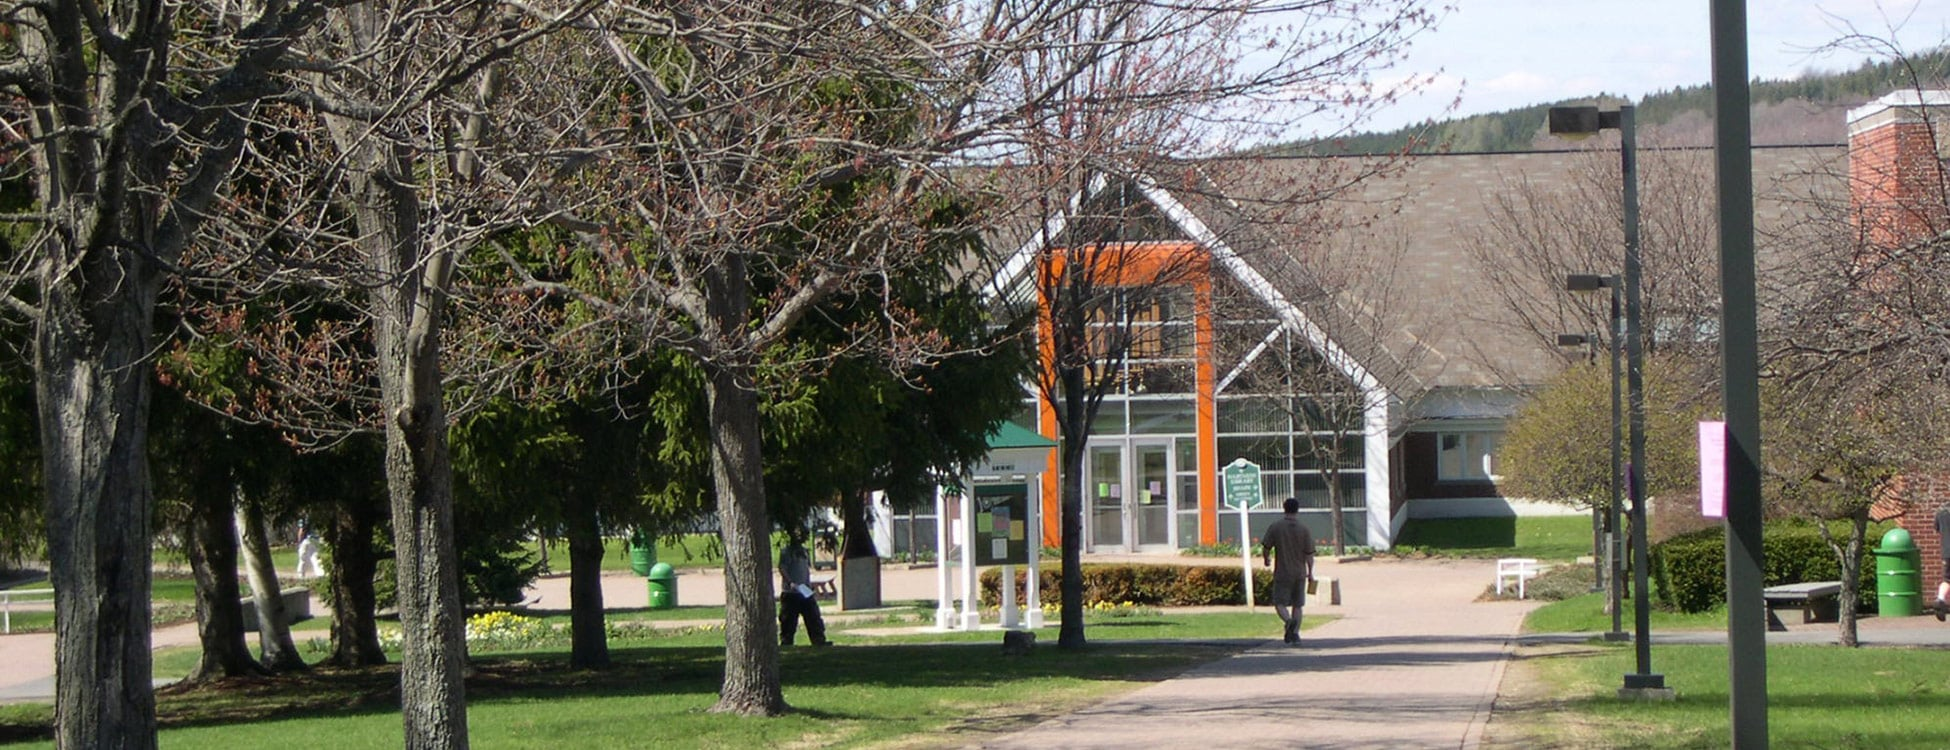 Randolph Center campus, Administrative building, walkway